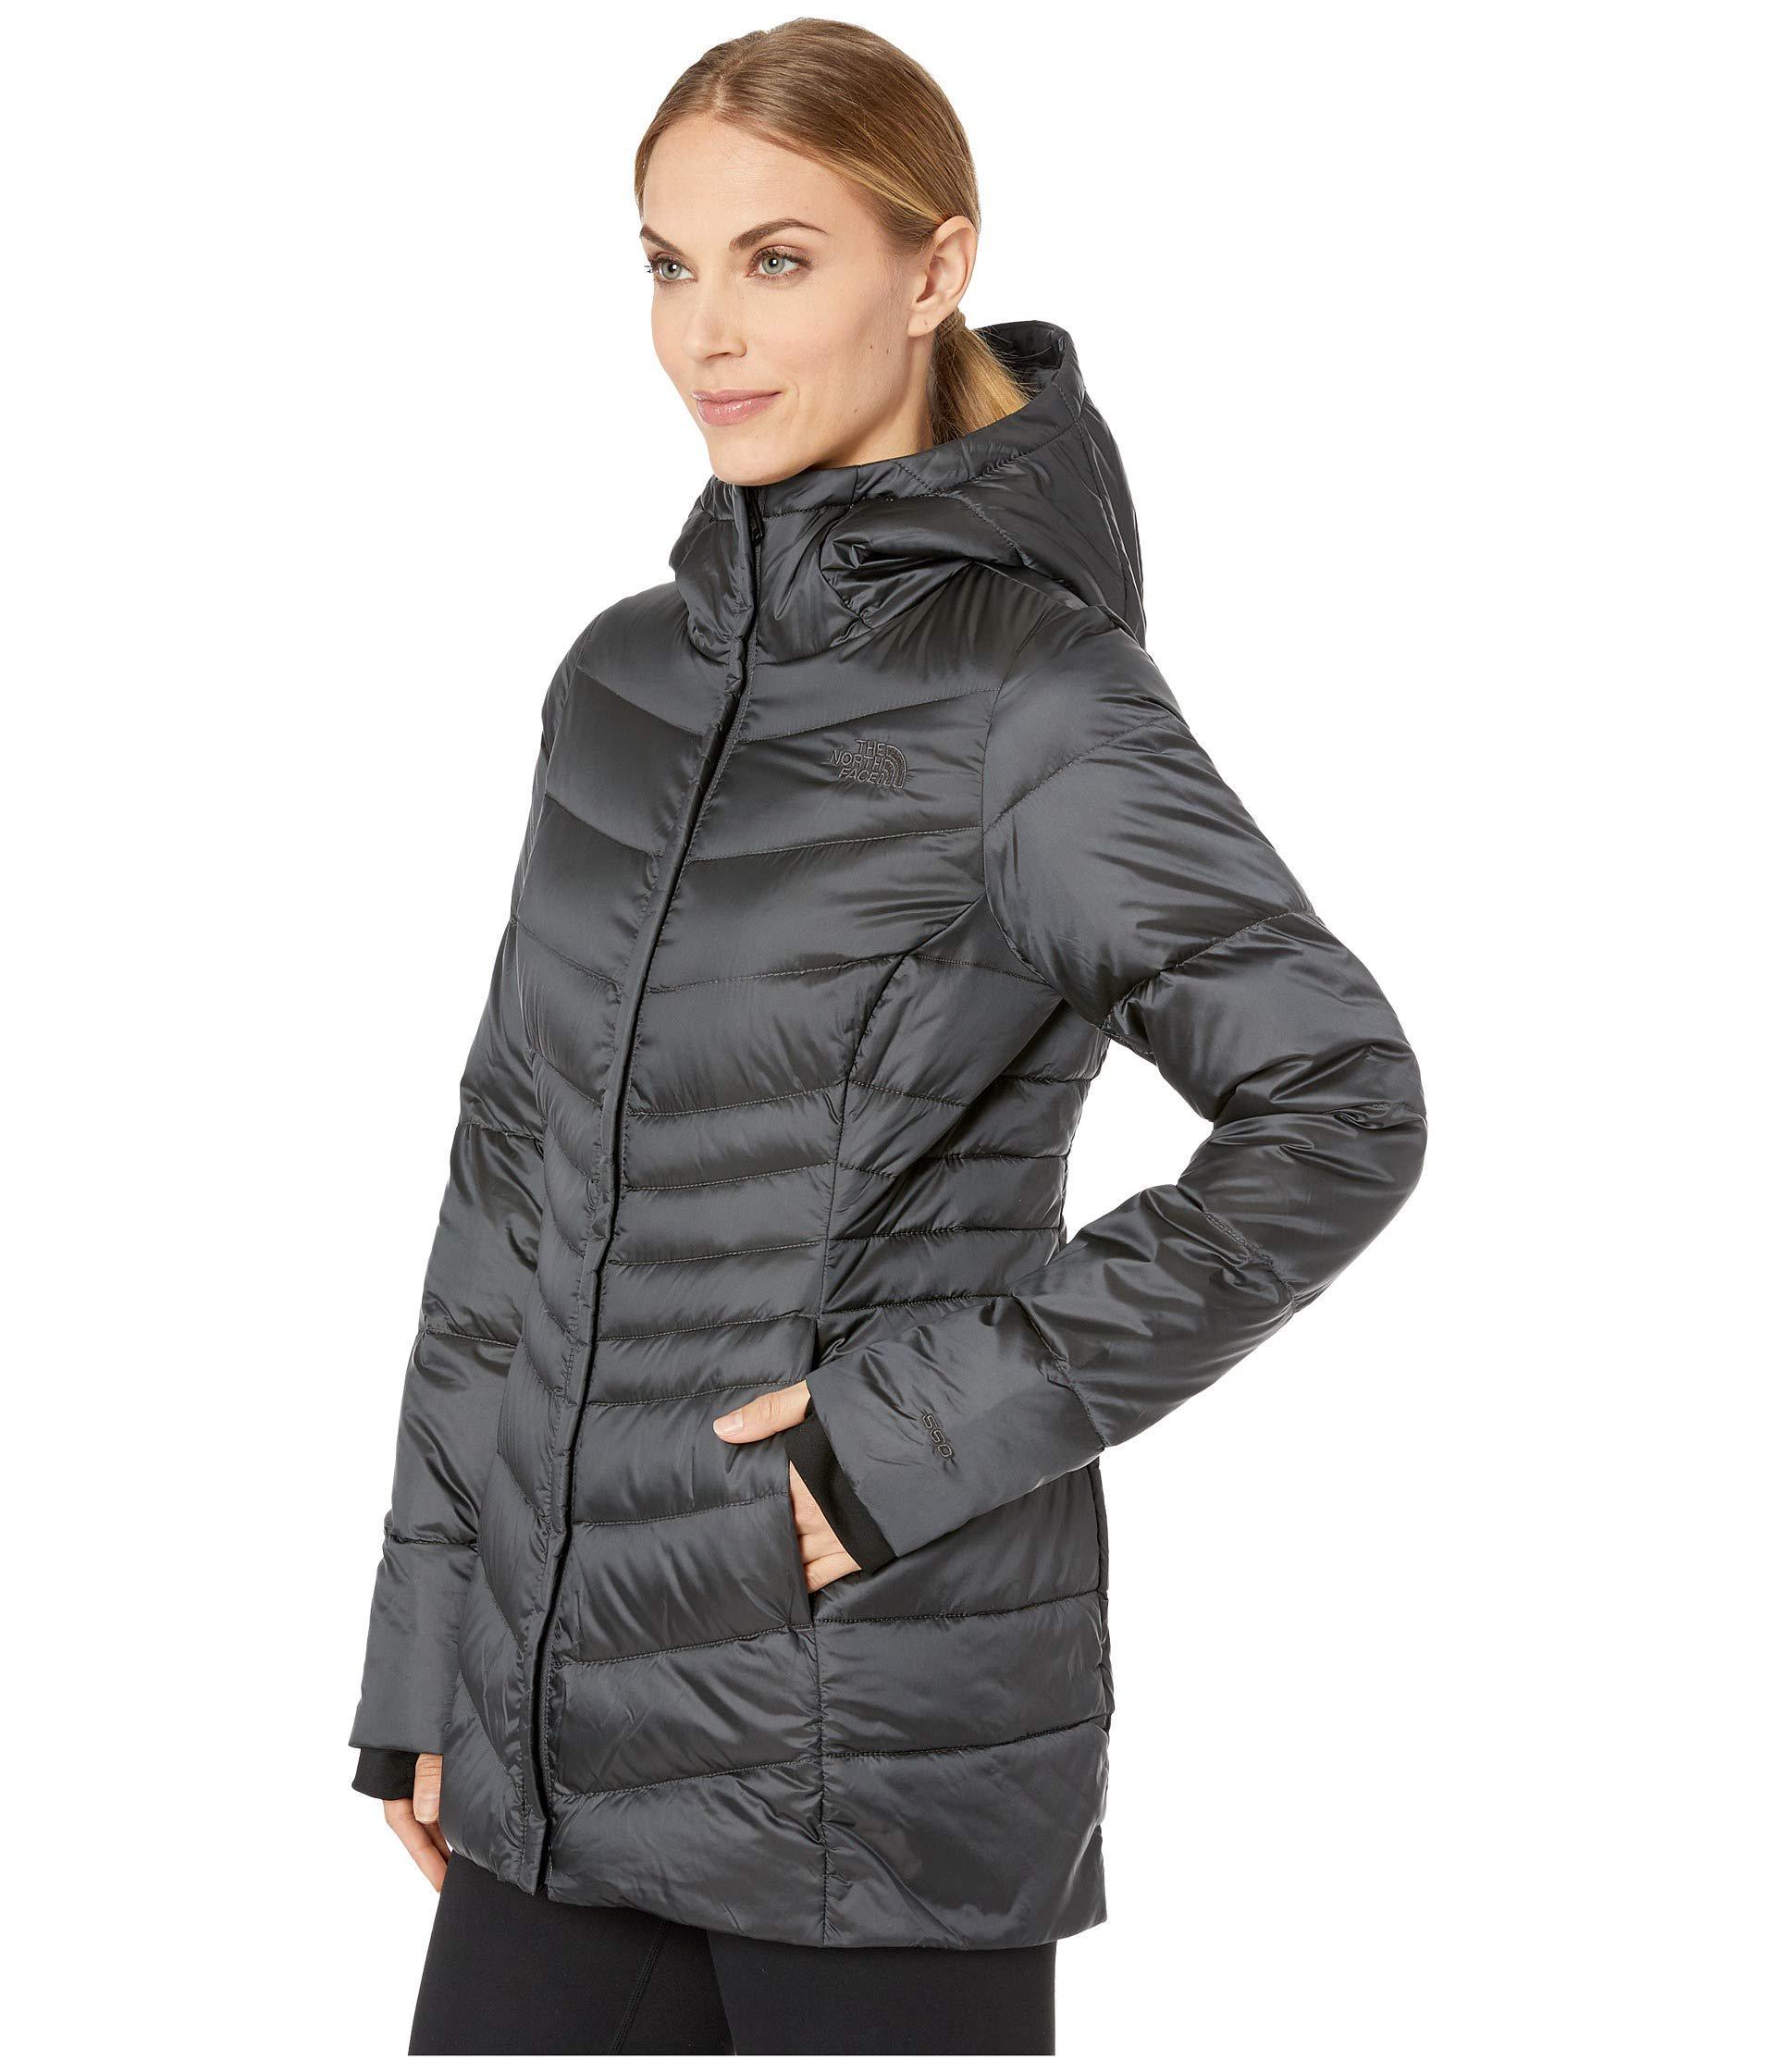 422537c4d4 Lyst - The North Face Aconcagua Parka Ii (tnf Black) Women s Coat in Gray